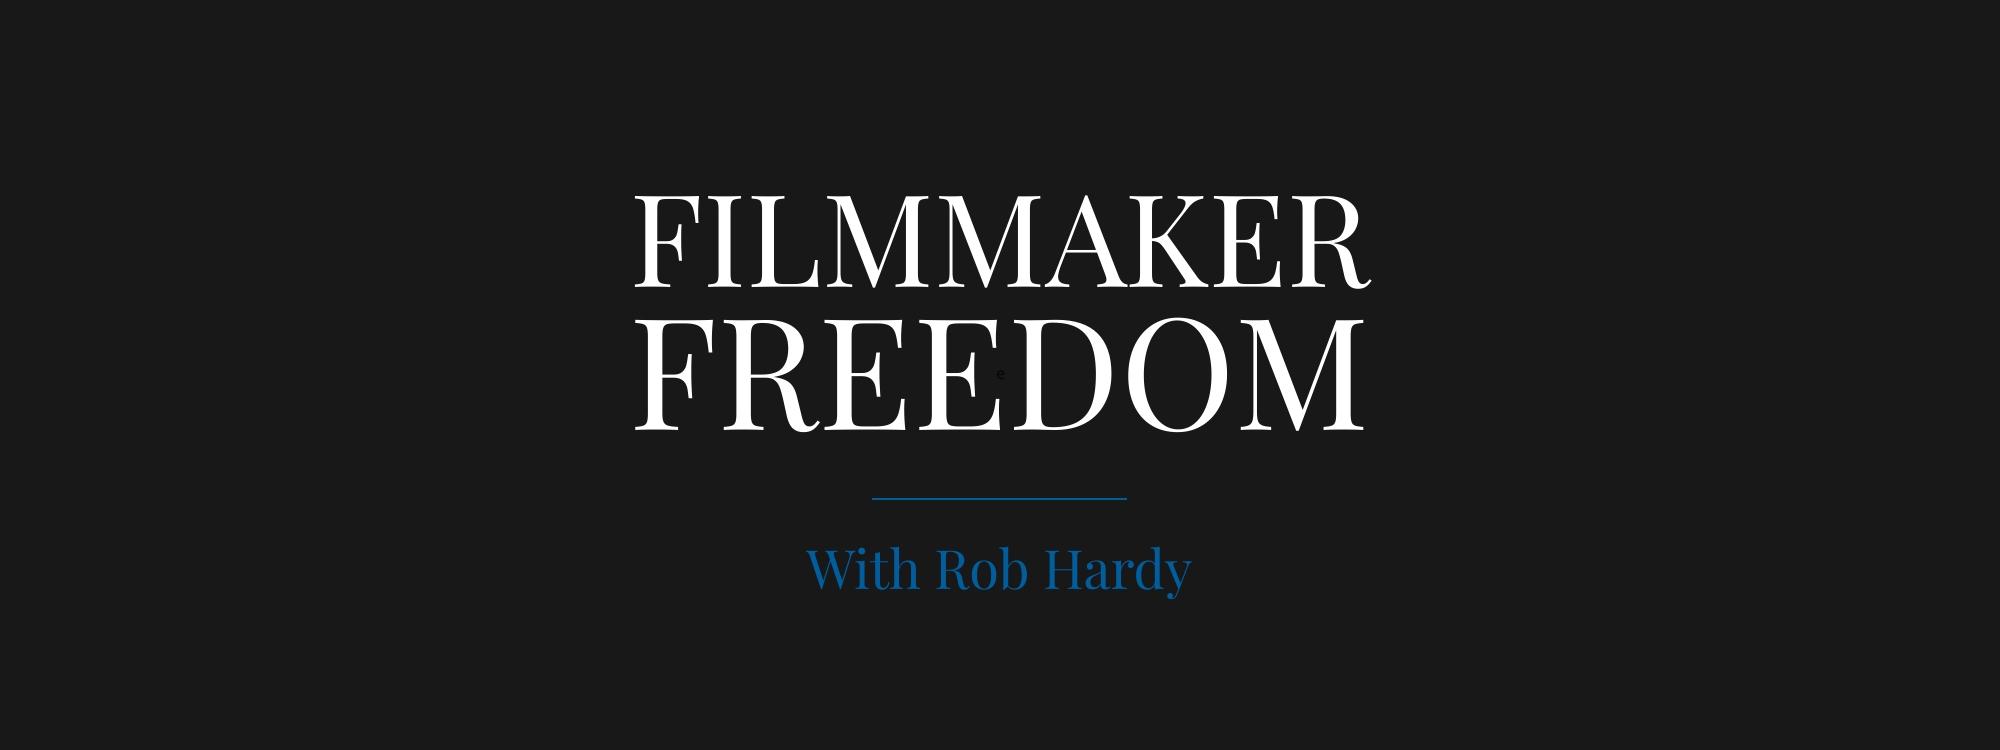 (COPY) Filmmaker Freedom Wide Cover - Facebook Cover - Custom dimensions (1).jpeg